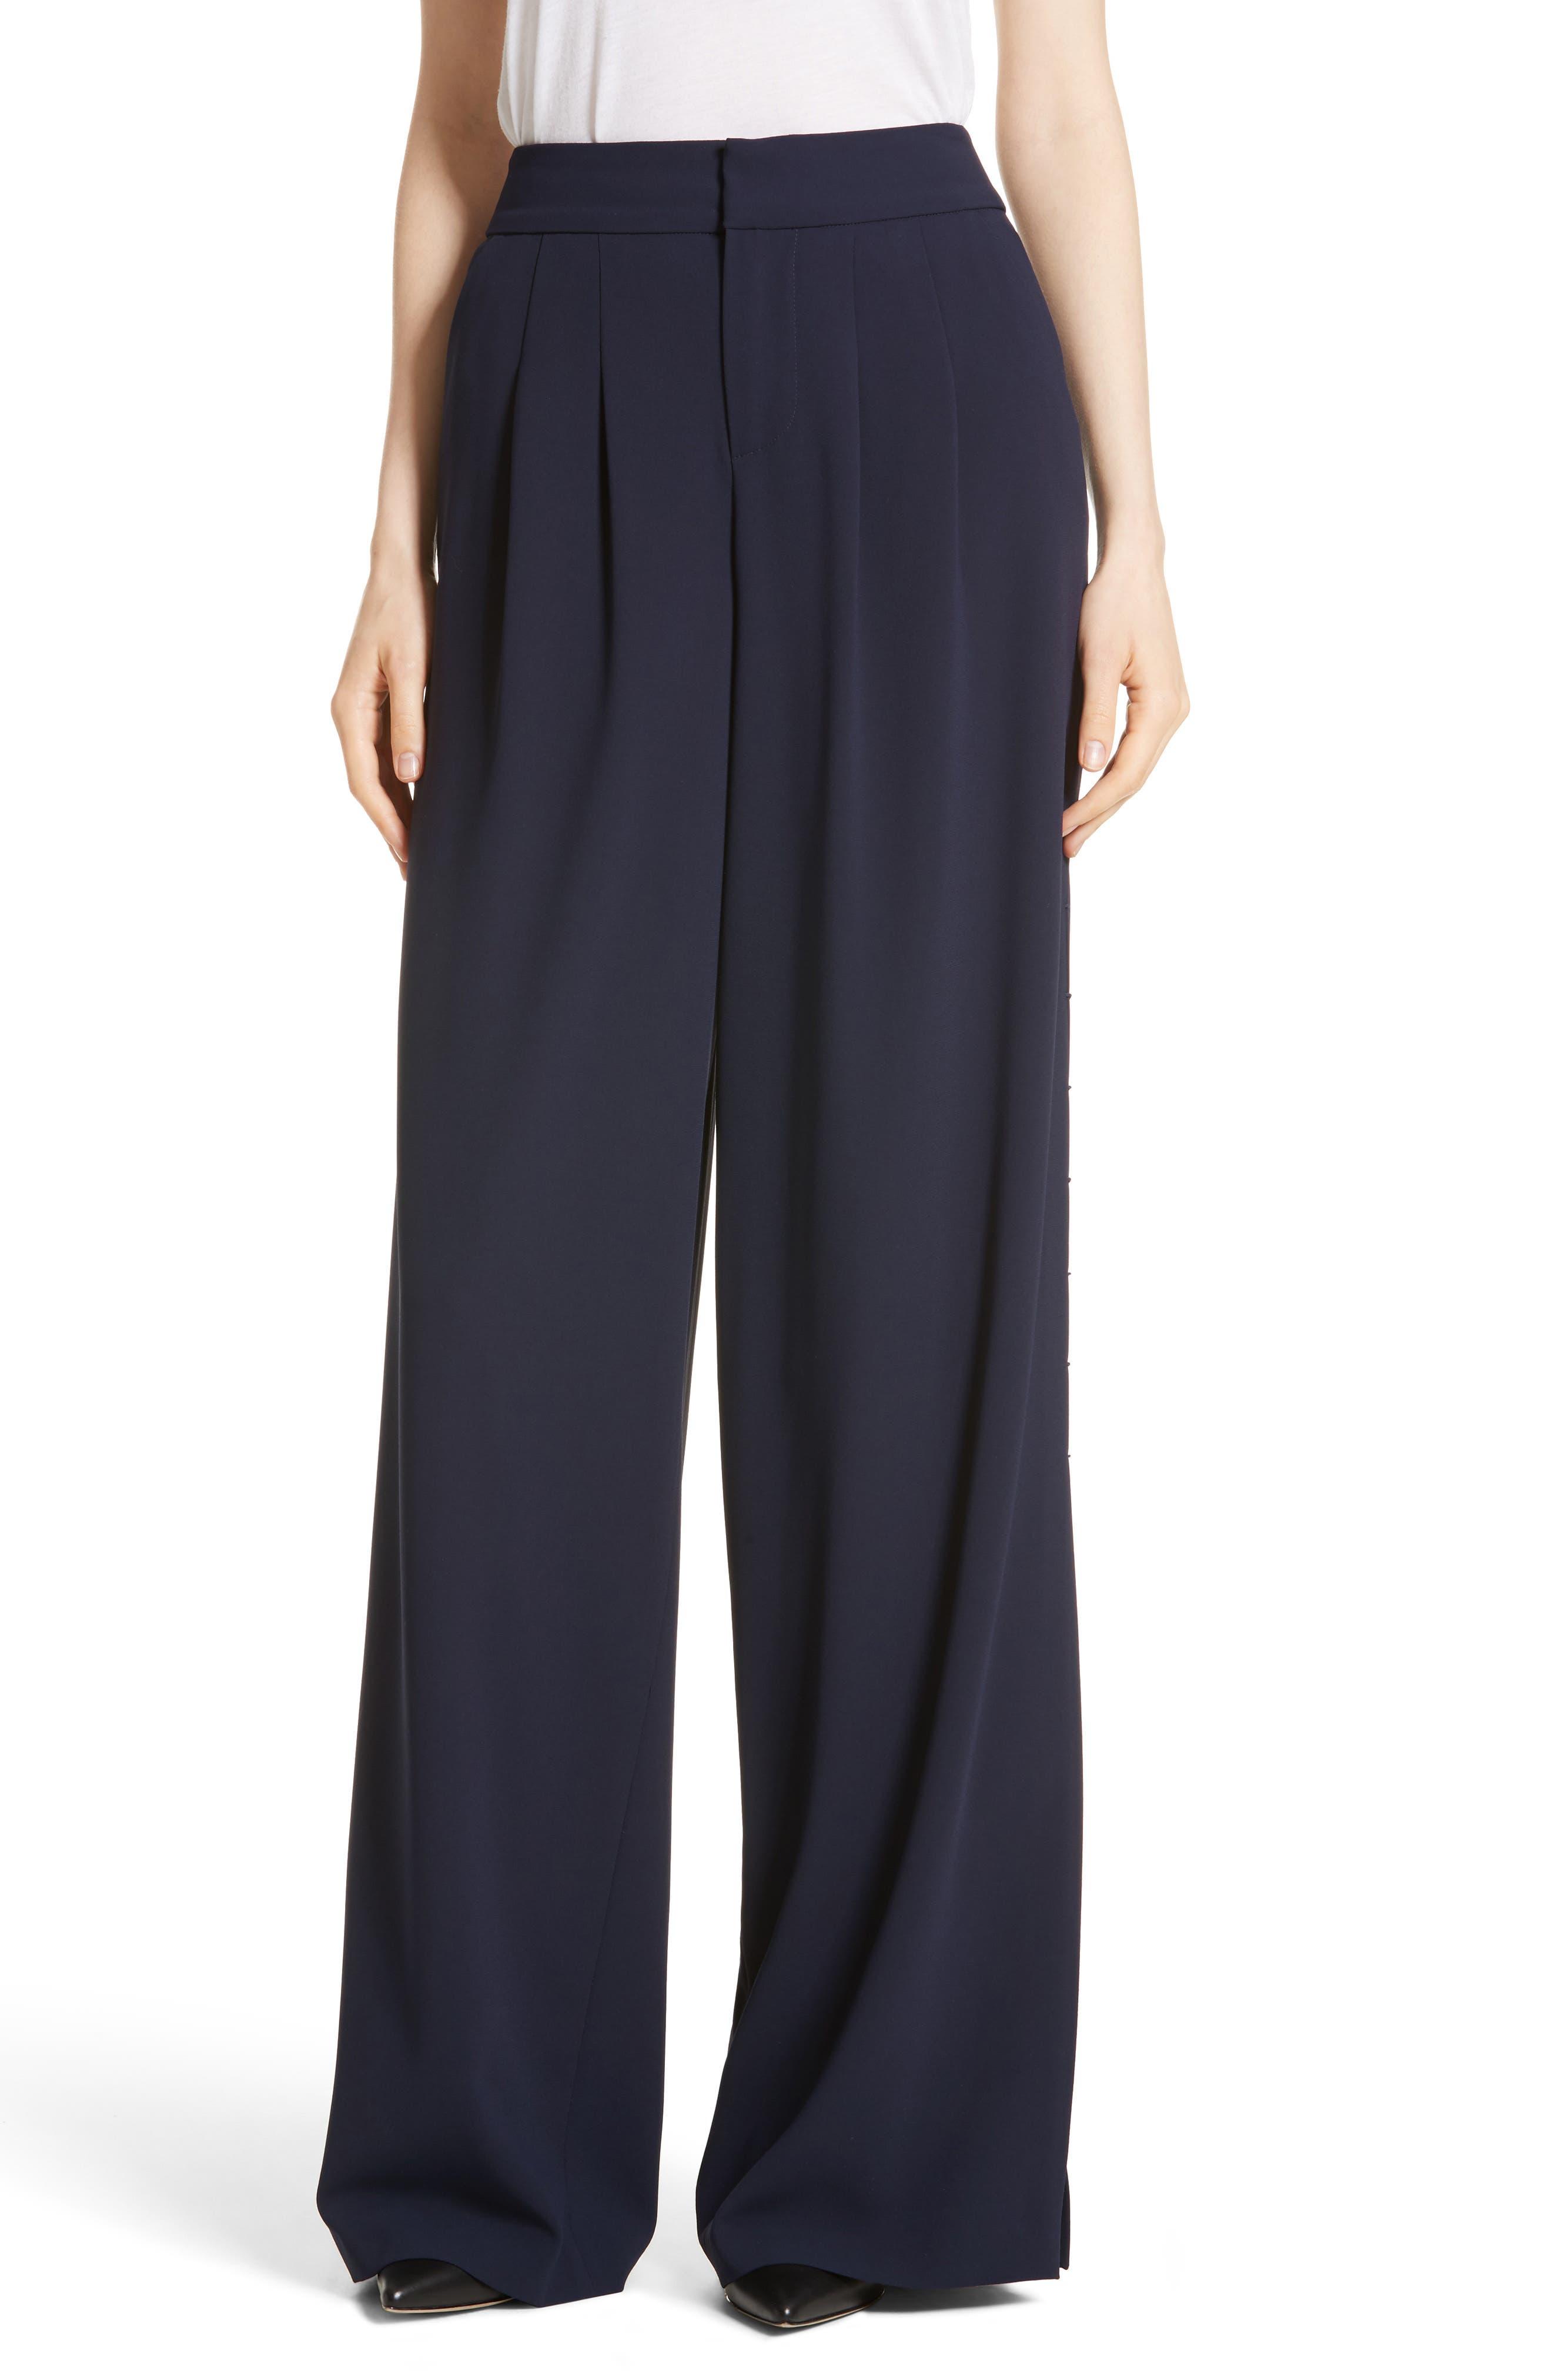 Shavon High Waist Side Slit Flare Pants,                             Main thumbnail 1, color,                             400